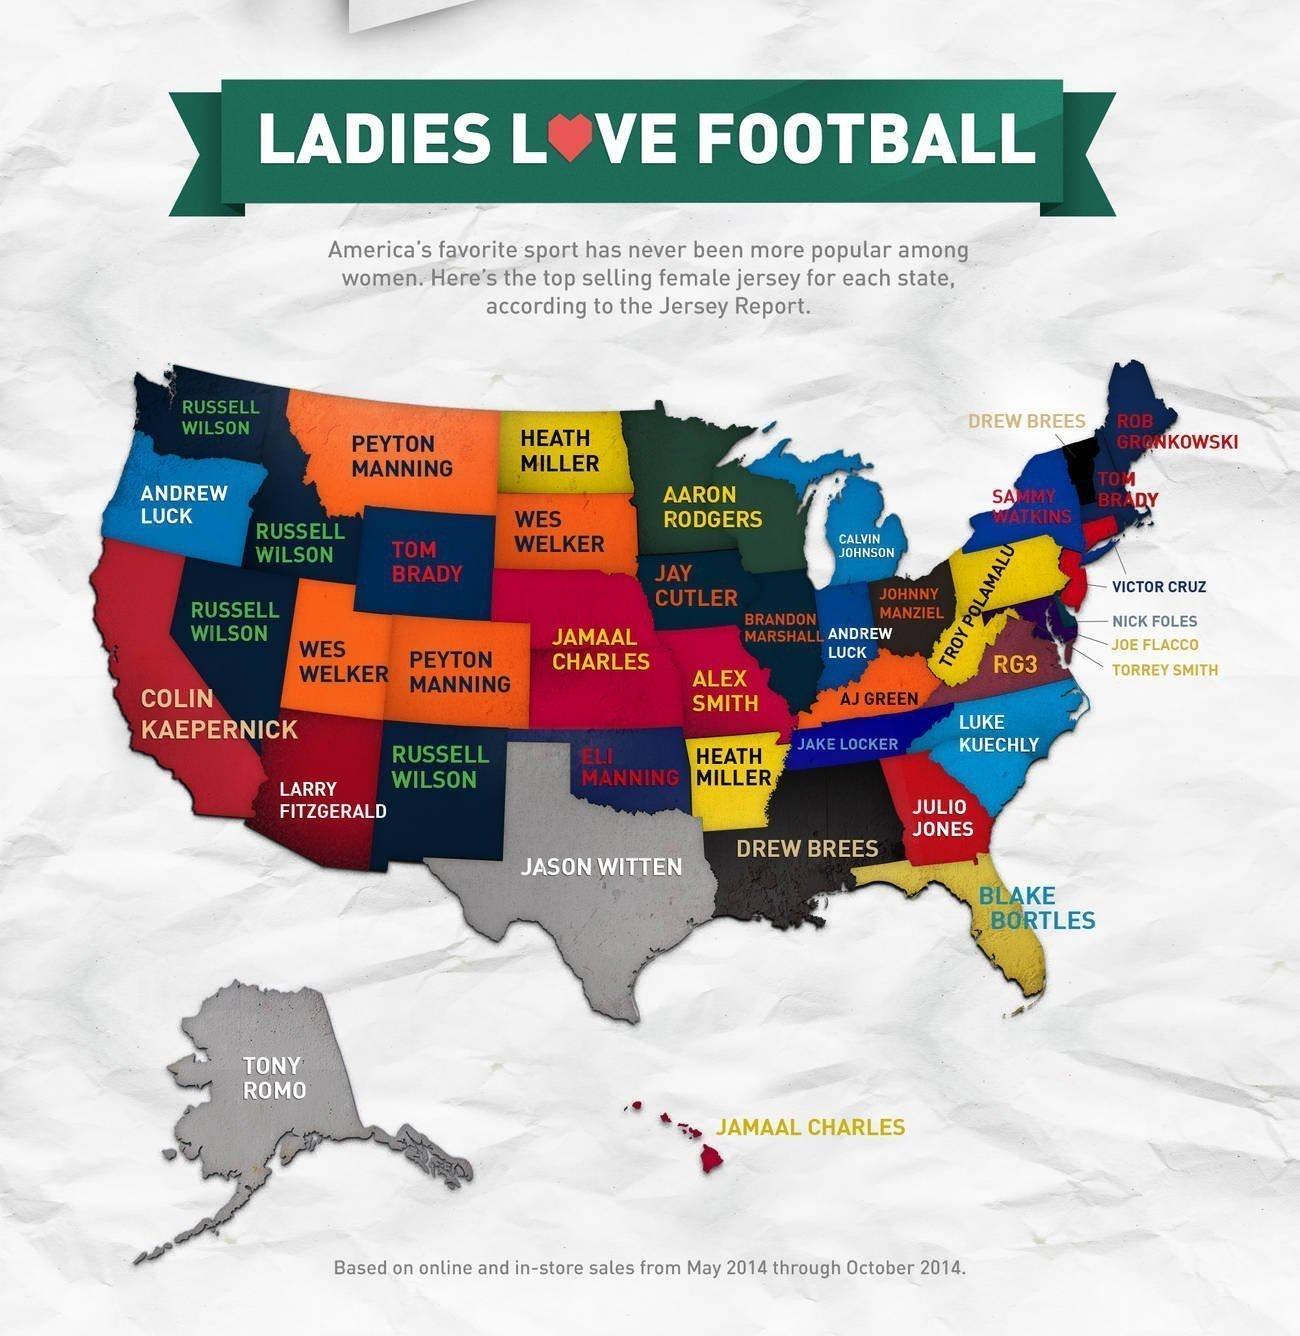 Most popular women s NFL jersey in California  - The San Diego Union-Tribune 564b357774